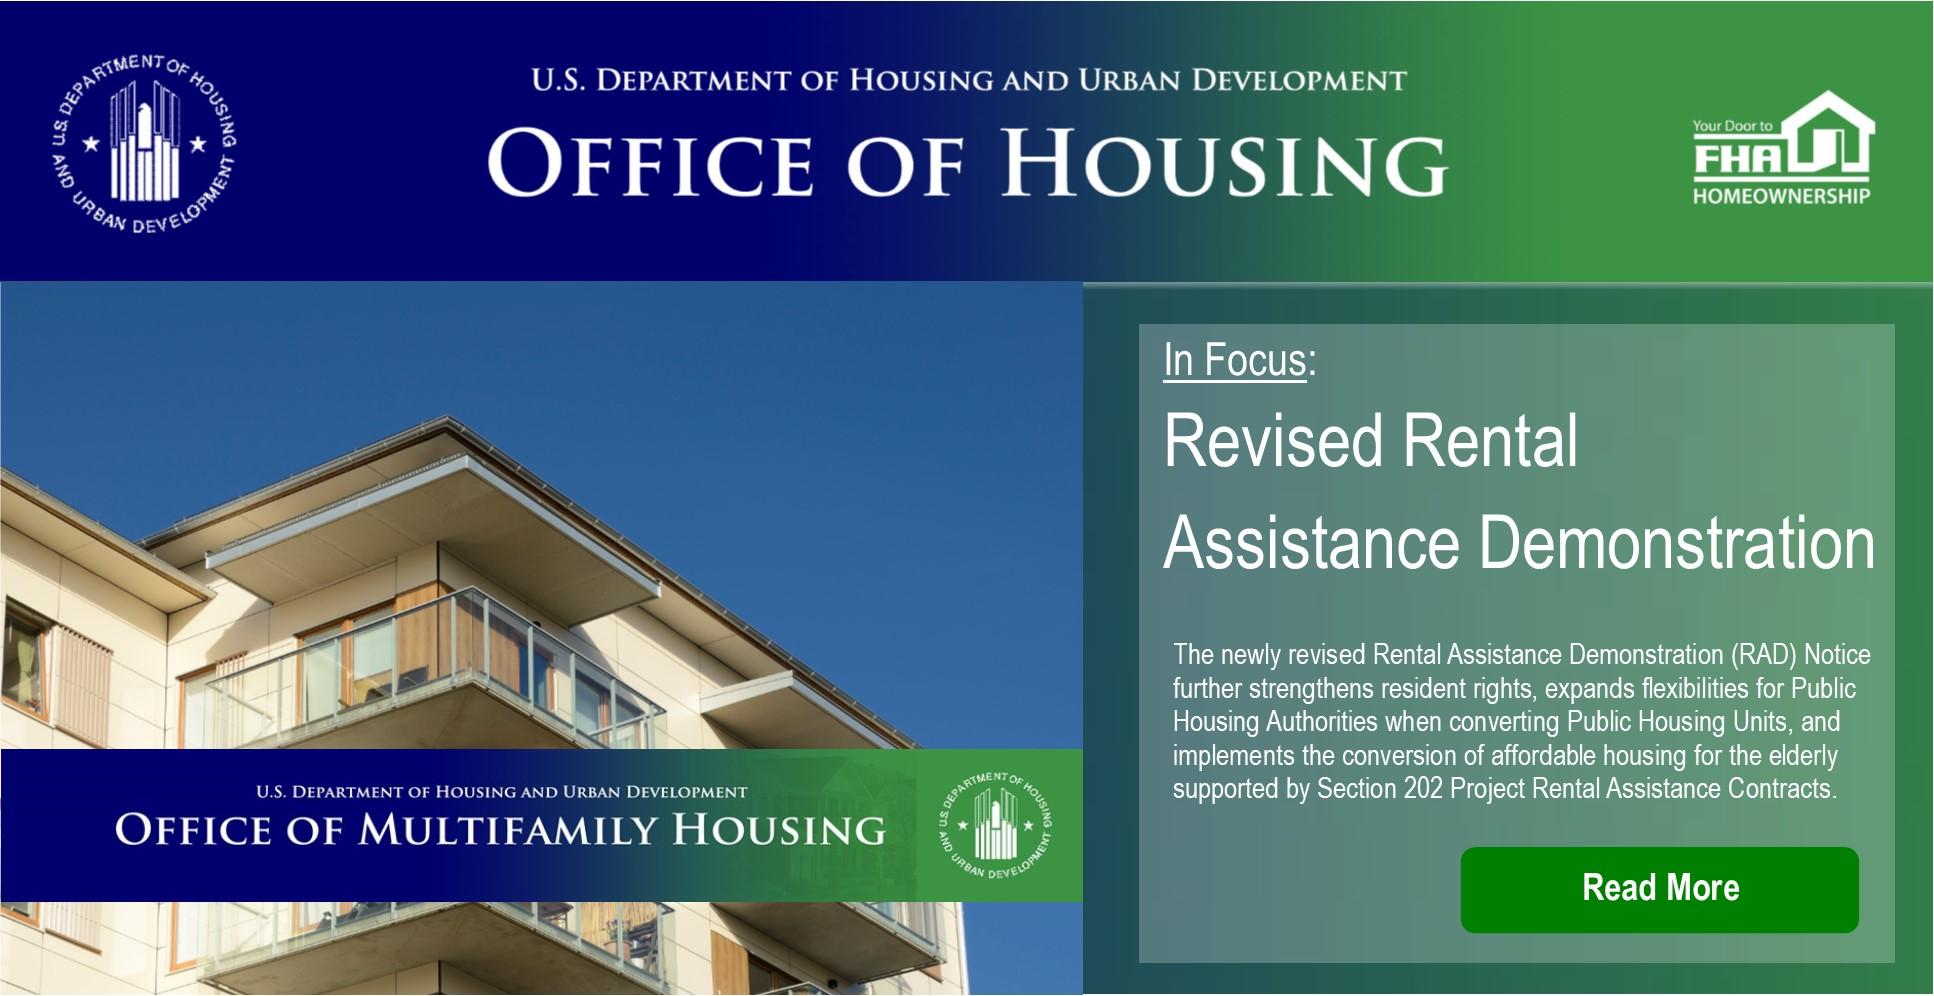 HUD gov / U S  Department of Housing and Urban Development (HUD)